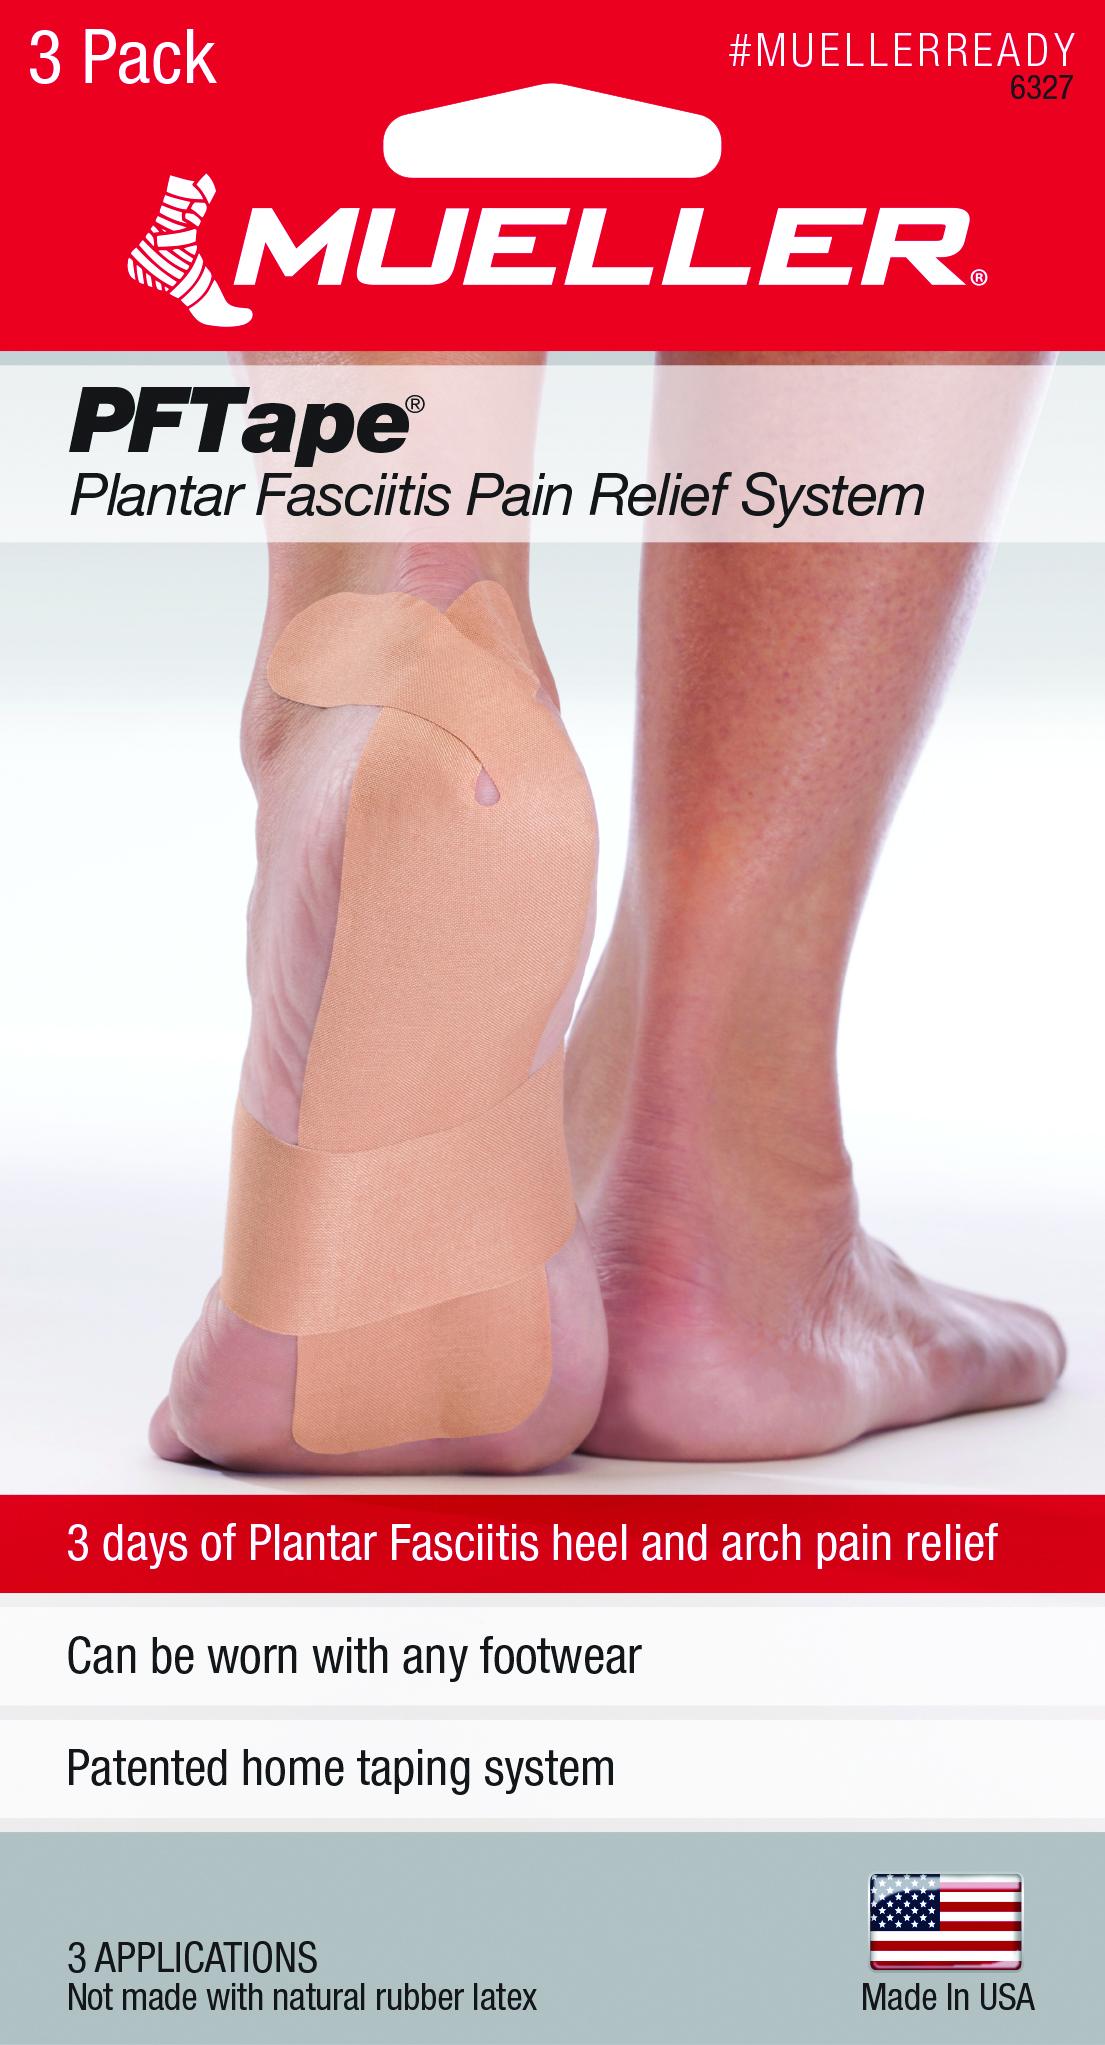 PFTape® Plantar Fasciitis Pain Relief System by Mueller Sports Medicine